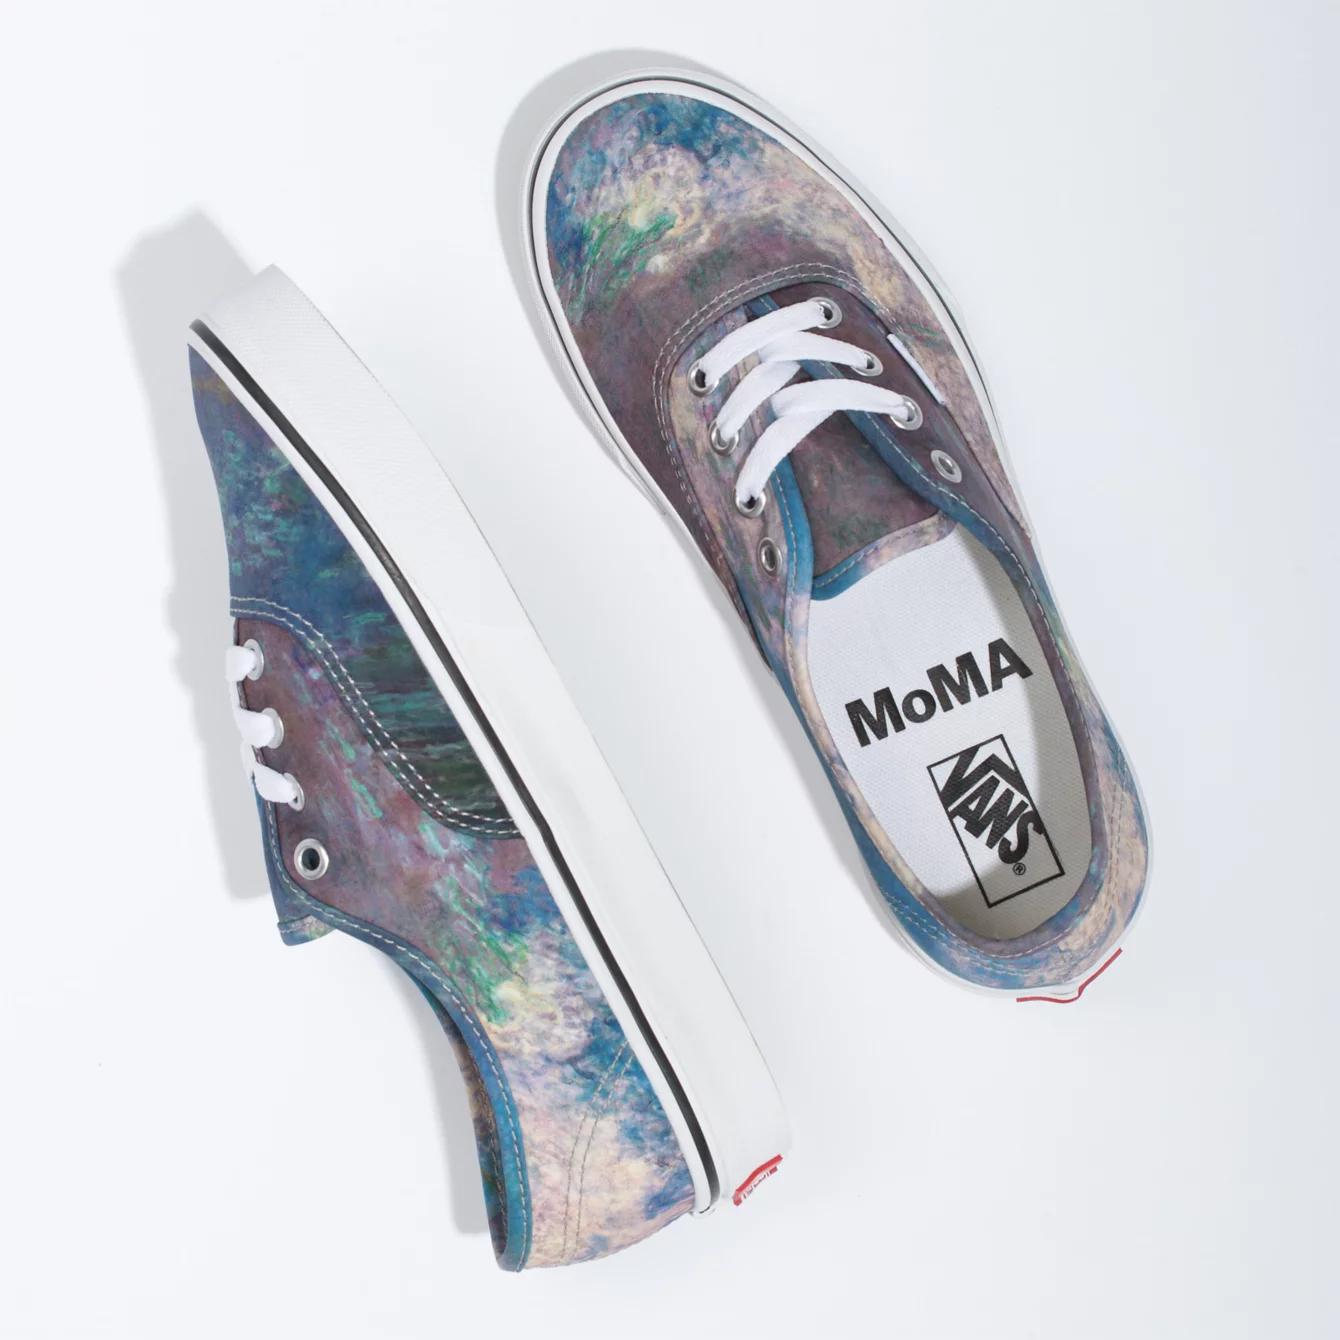 Zapatillas MoMA Claude Monet Authentic de Vans